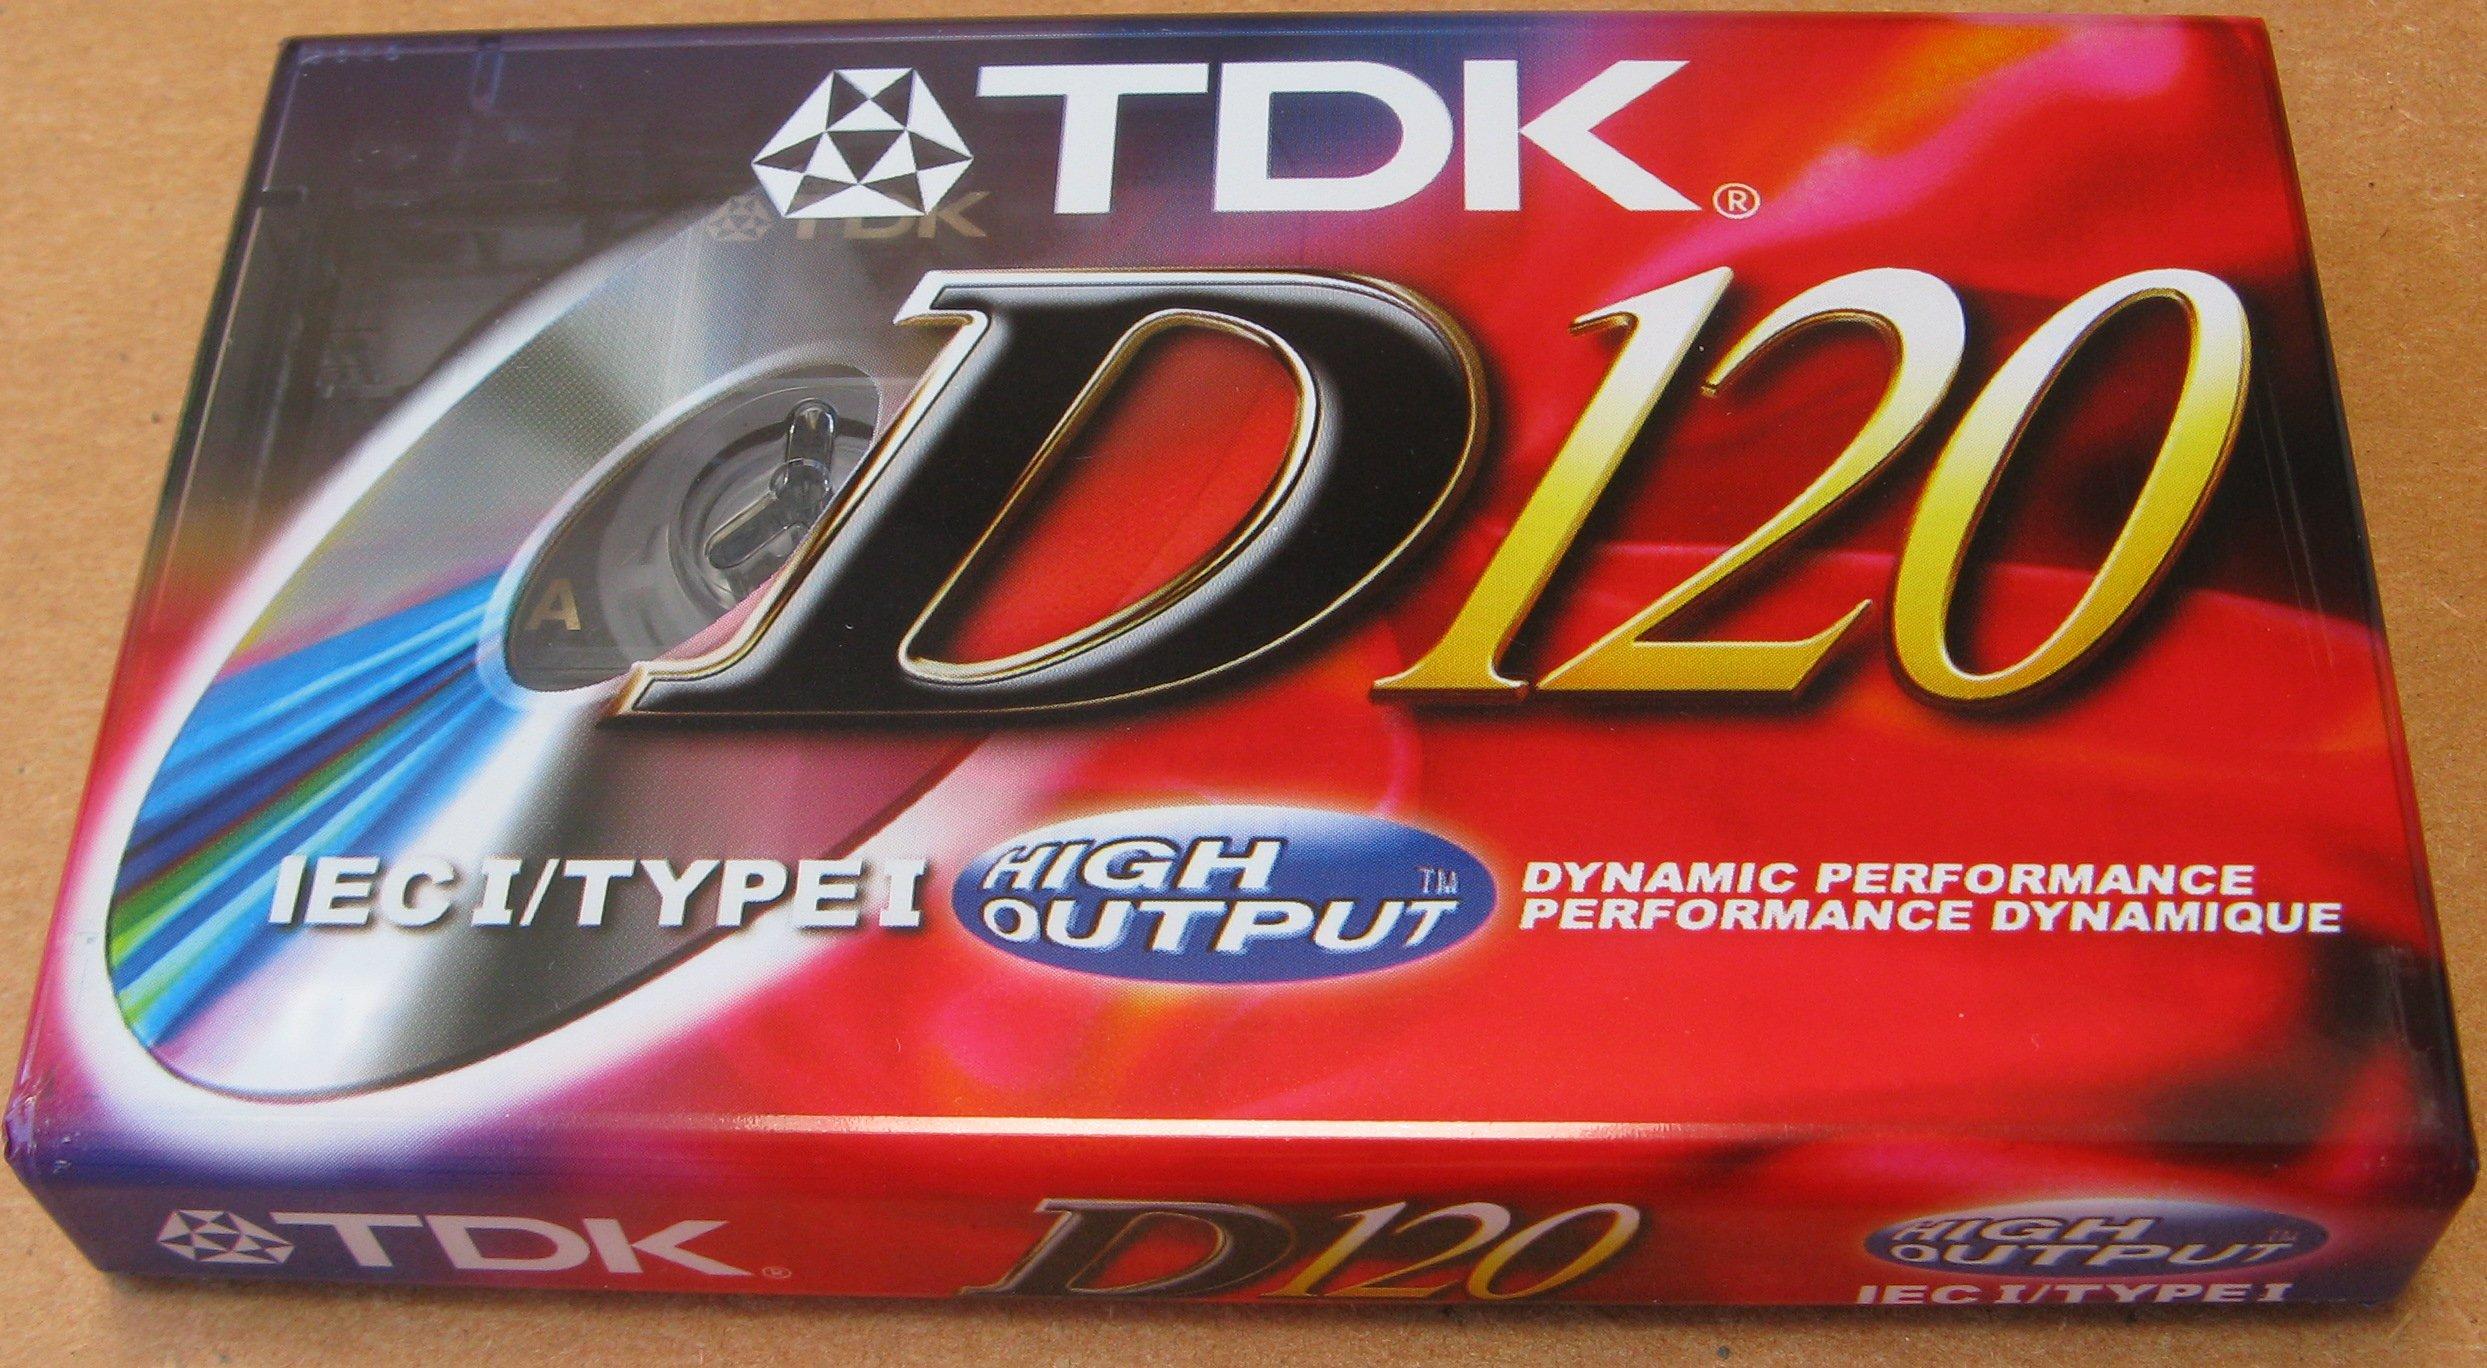 D5012 TDK D120 IEC I/Type I Dynamic Performance High Output Audio Cassette Tape